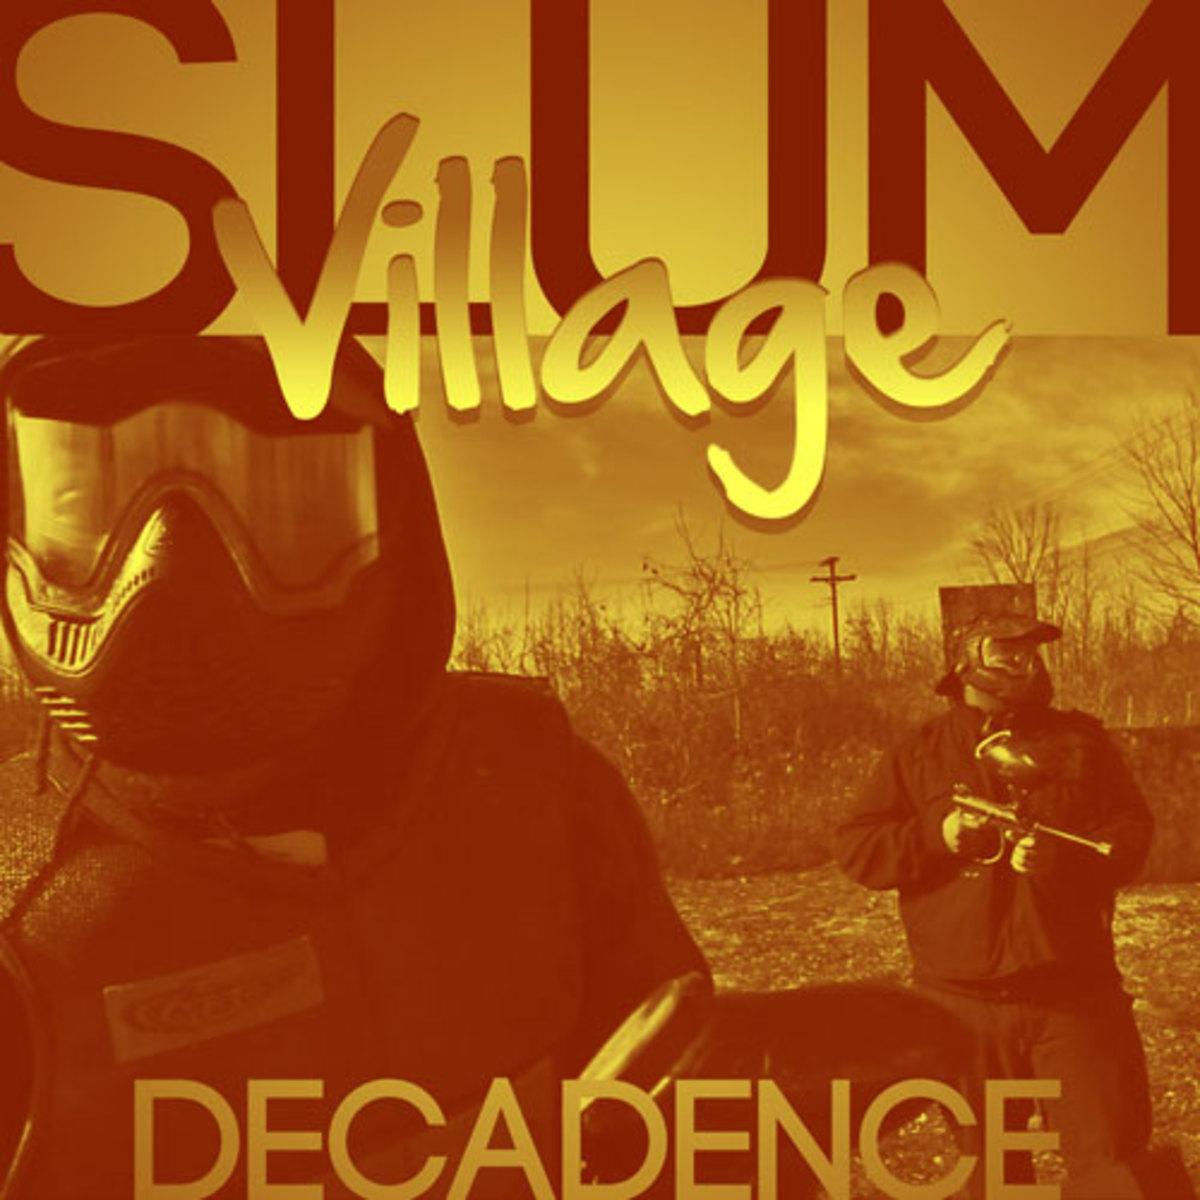 slumvillage-decadence.jpg